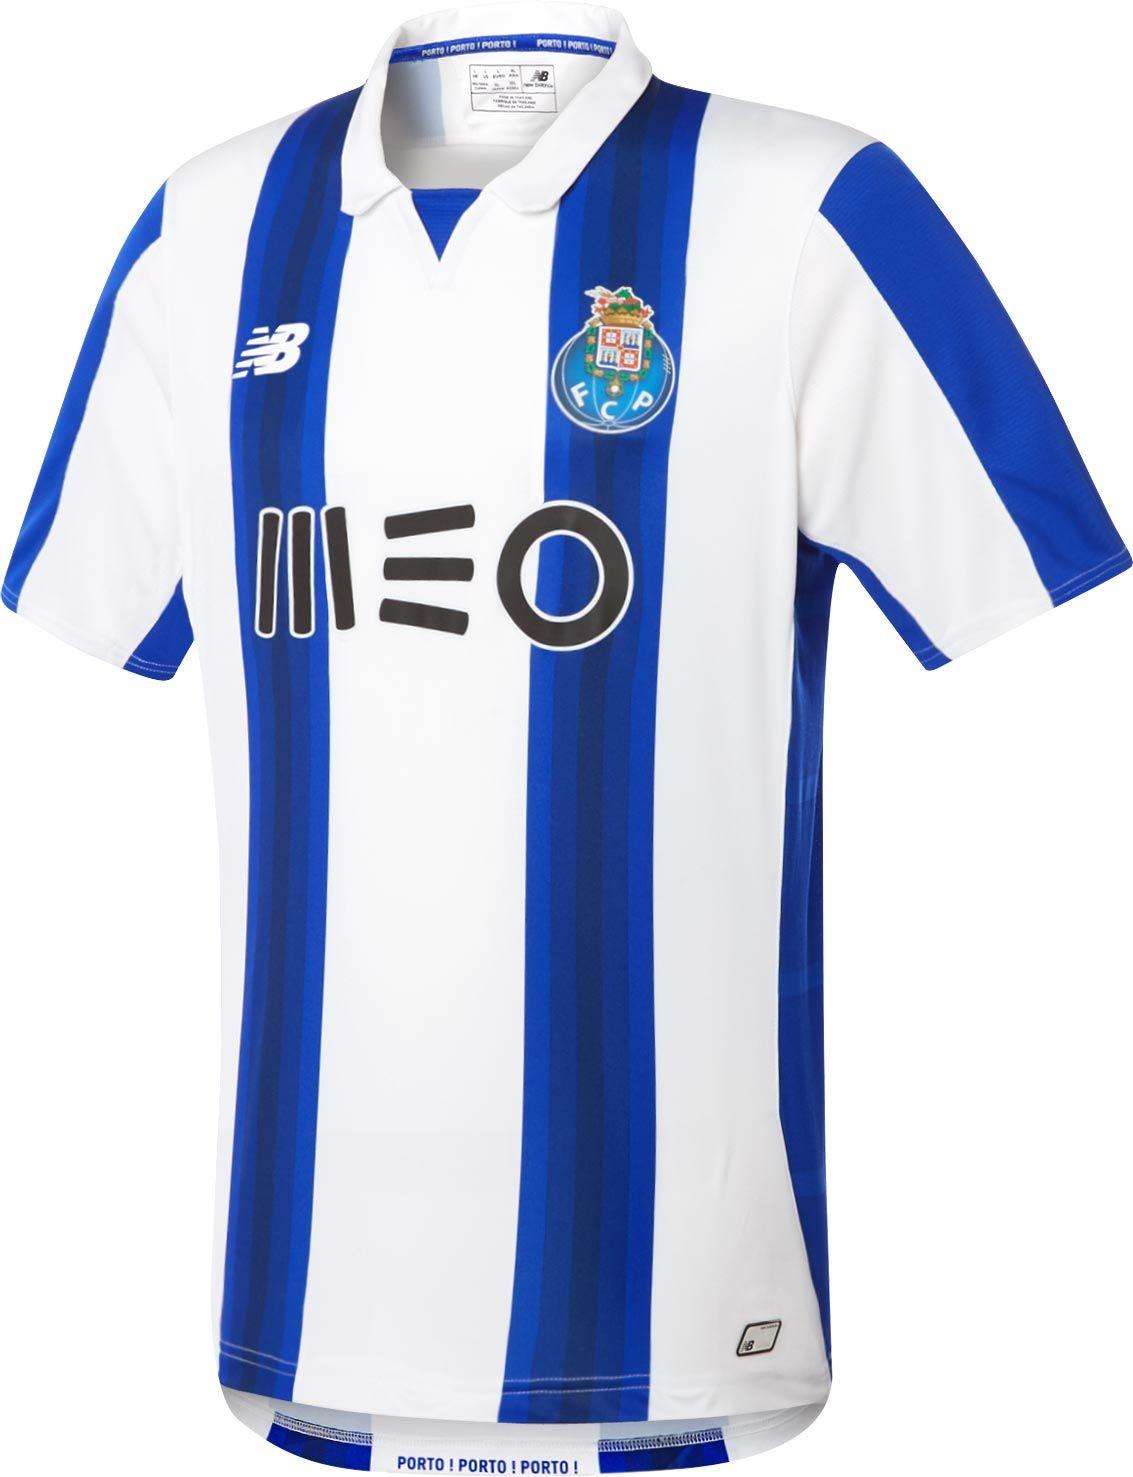 Football com category football kits image sl benfica 1st kit - Fc Porto Home Shirt 2016 2017 Discount Football Shirts Cheap Soccer Jerseys